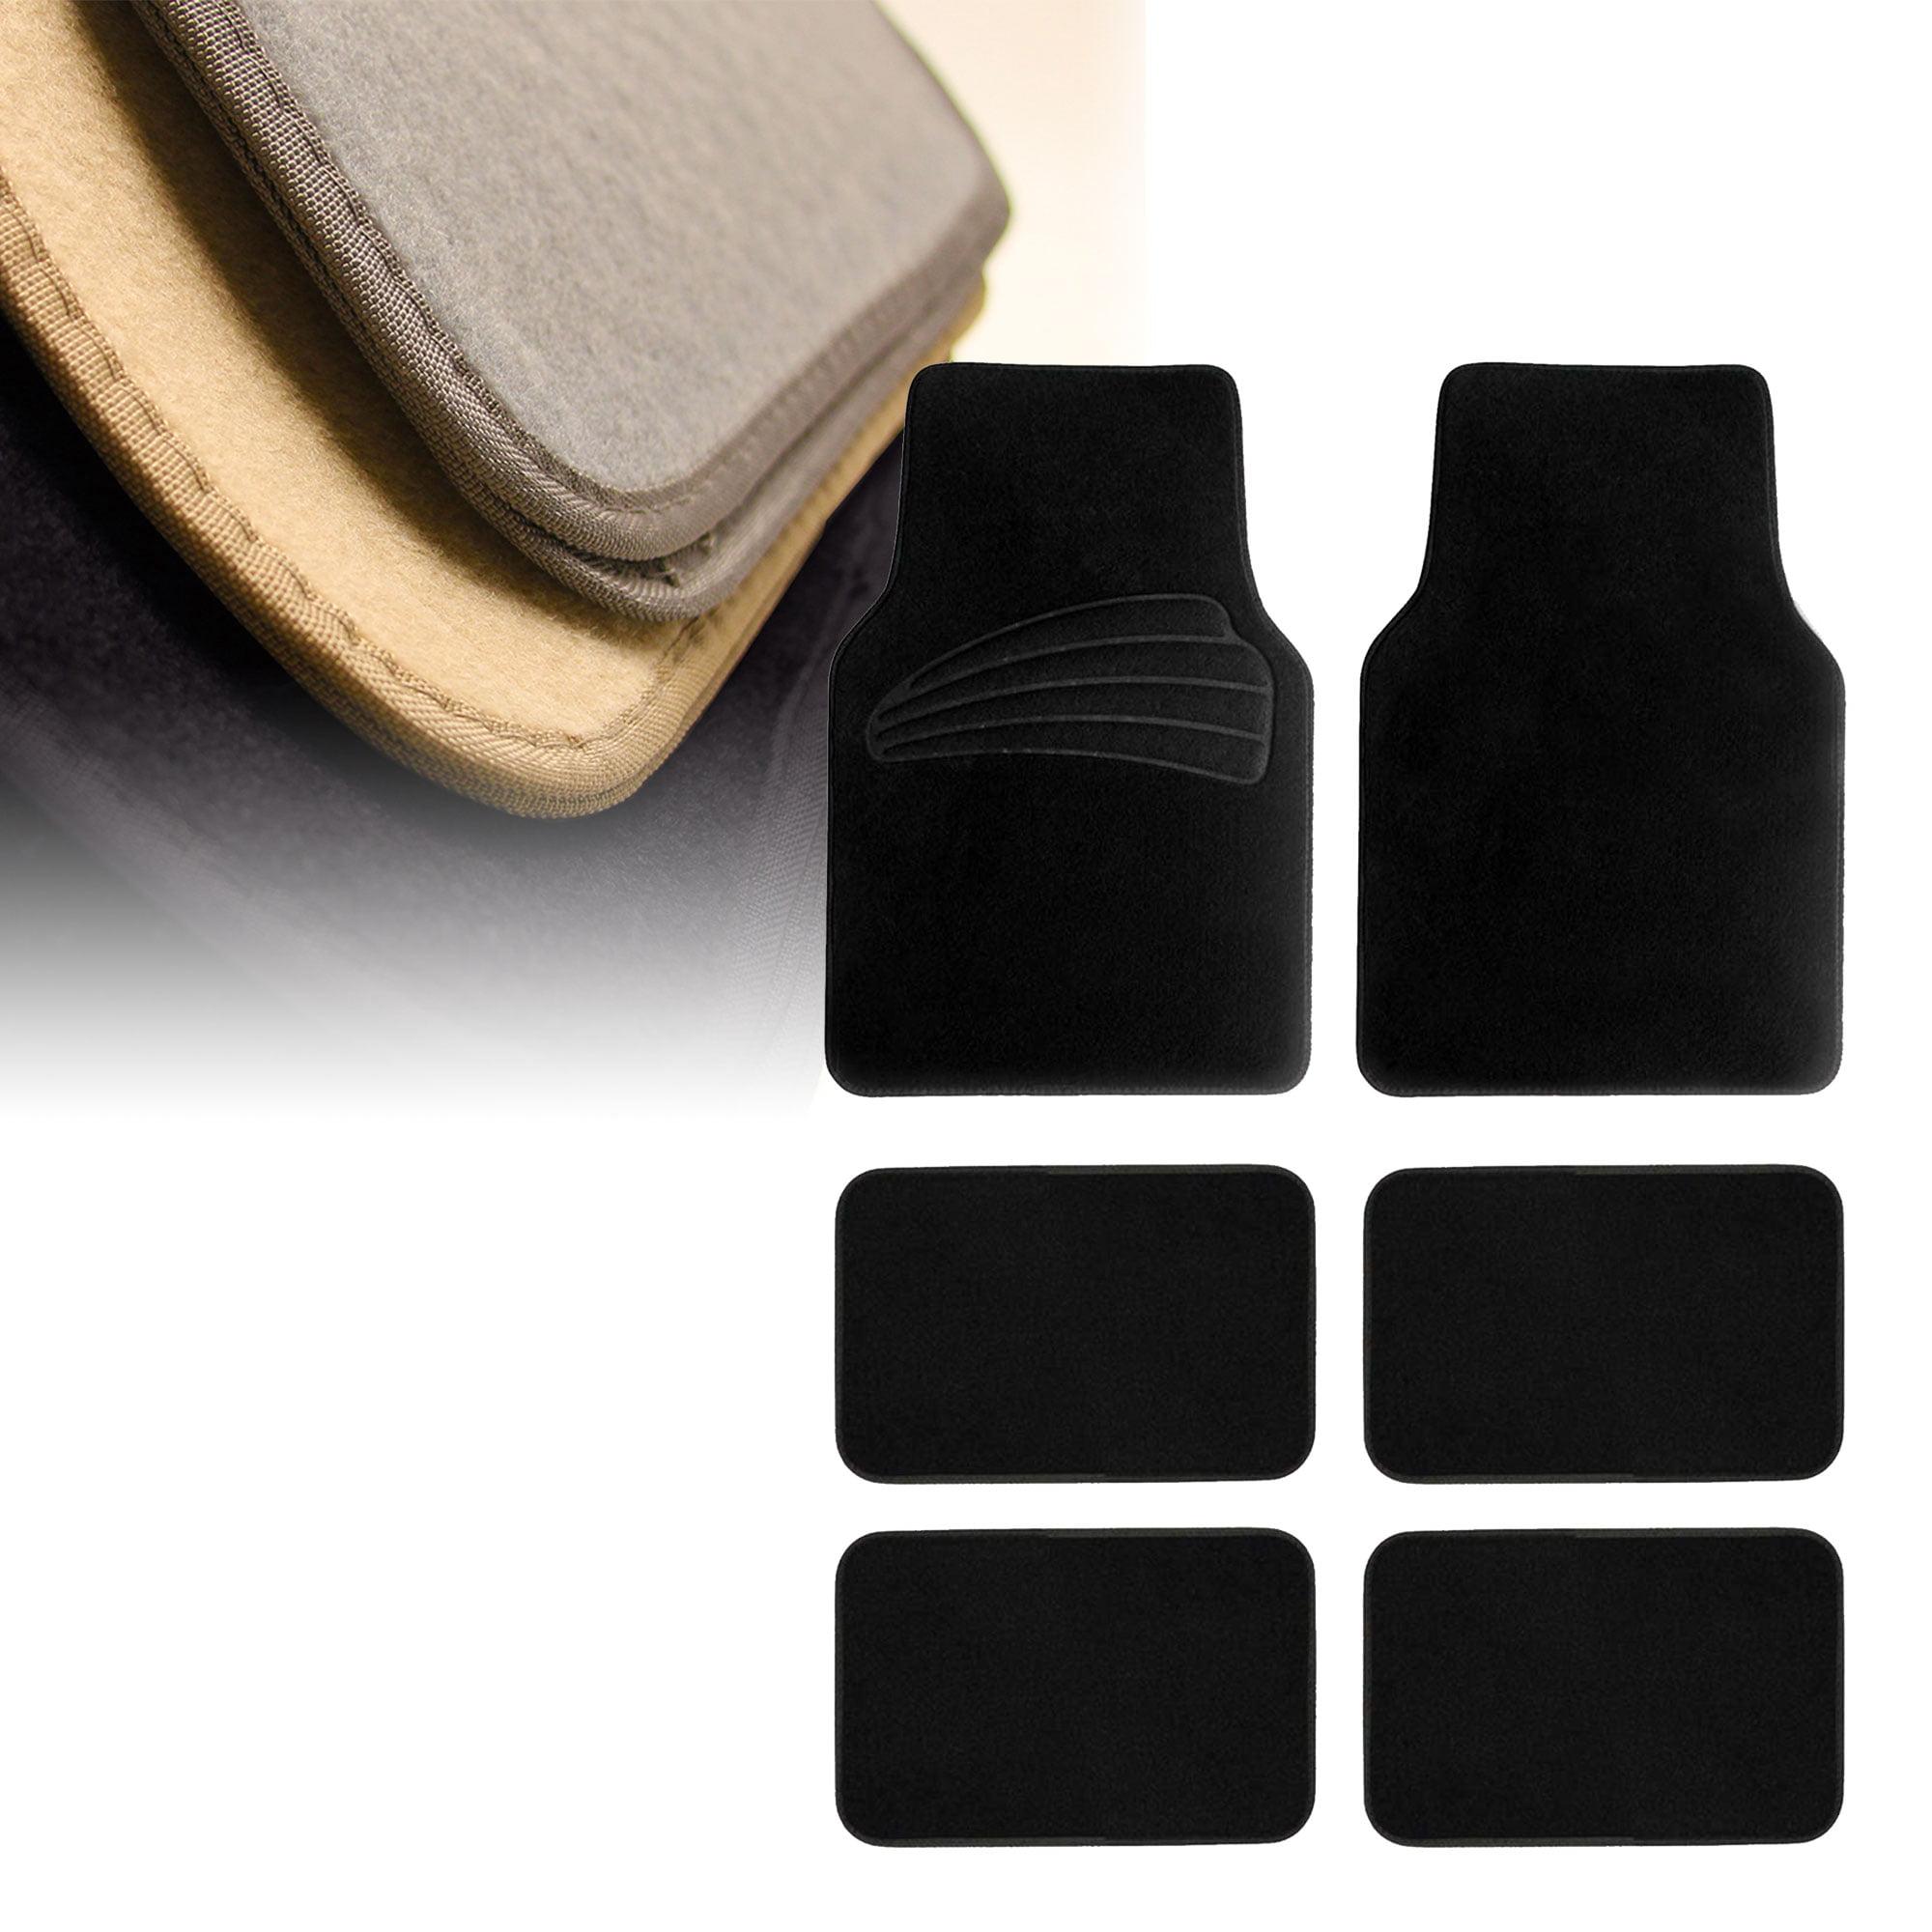 FH Group Premium Carpet Floor Mats With Heel Pad for SUV, VAN, 3 Row Full Set, Black